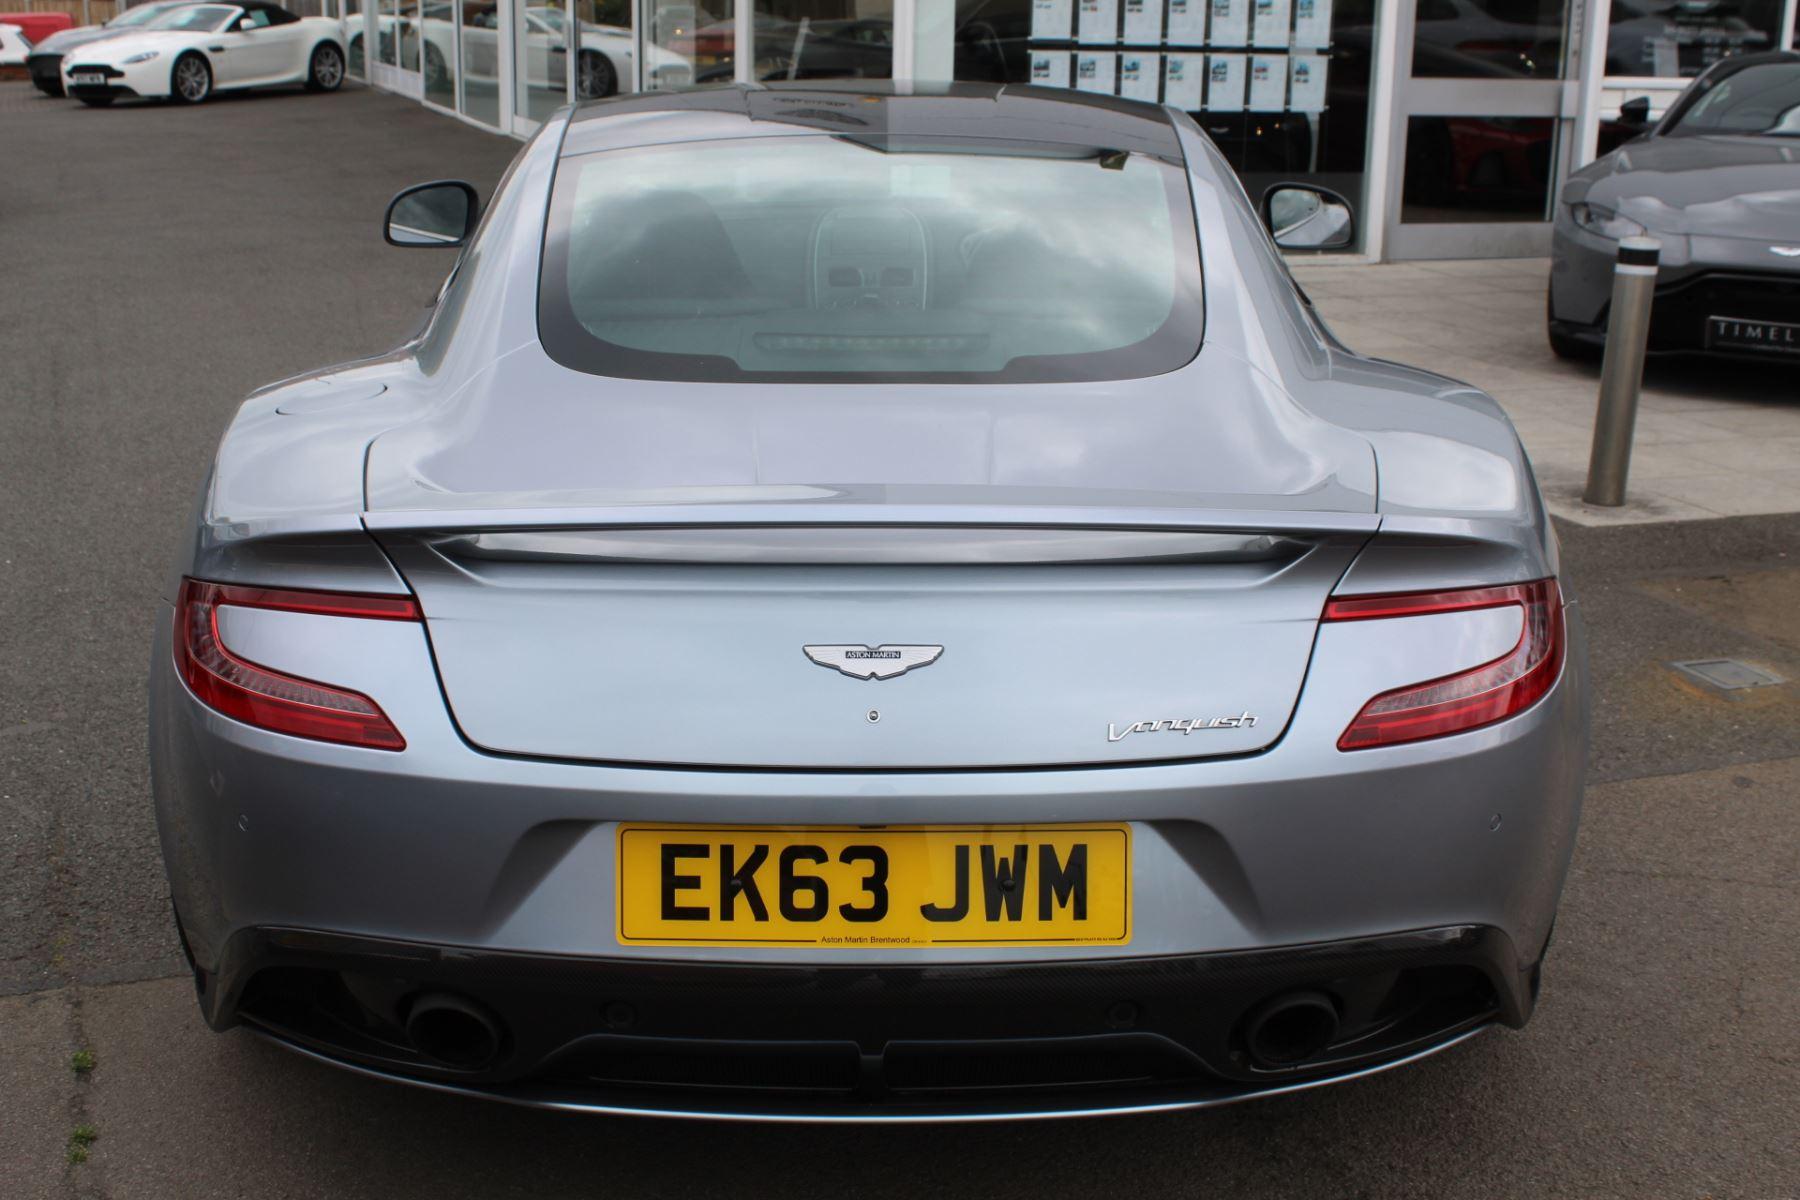 Aston Martin Vanquish V12 2+2 2dr Touchtronic image 8